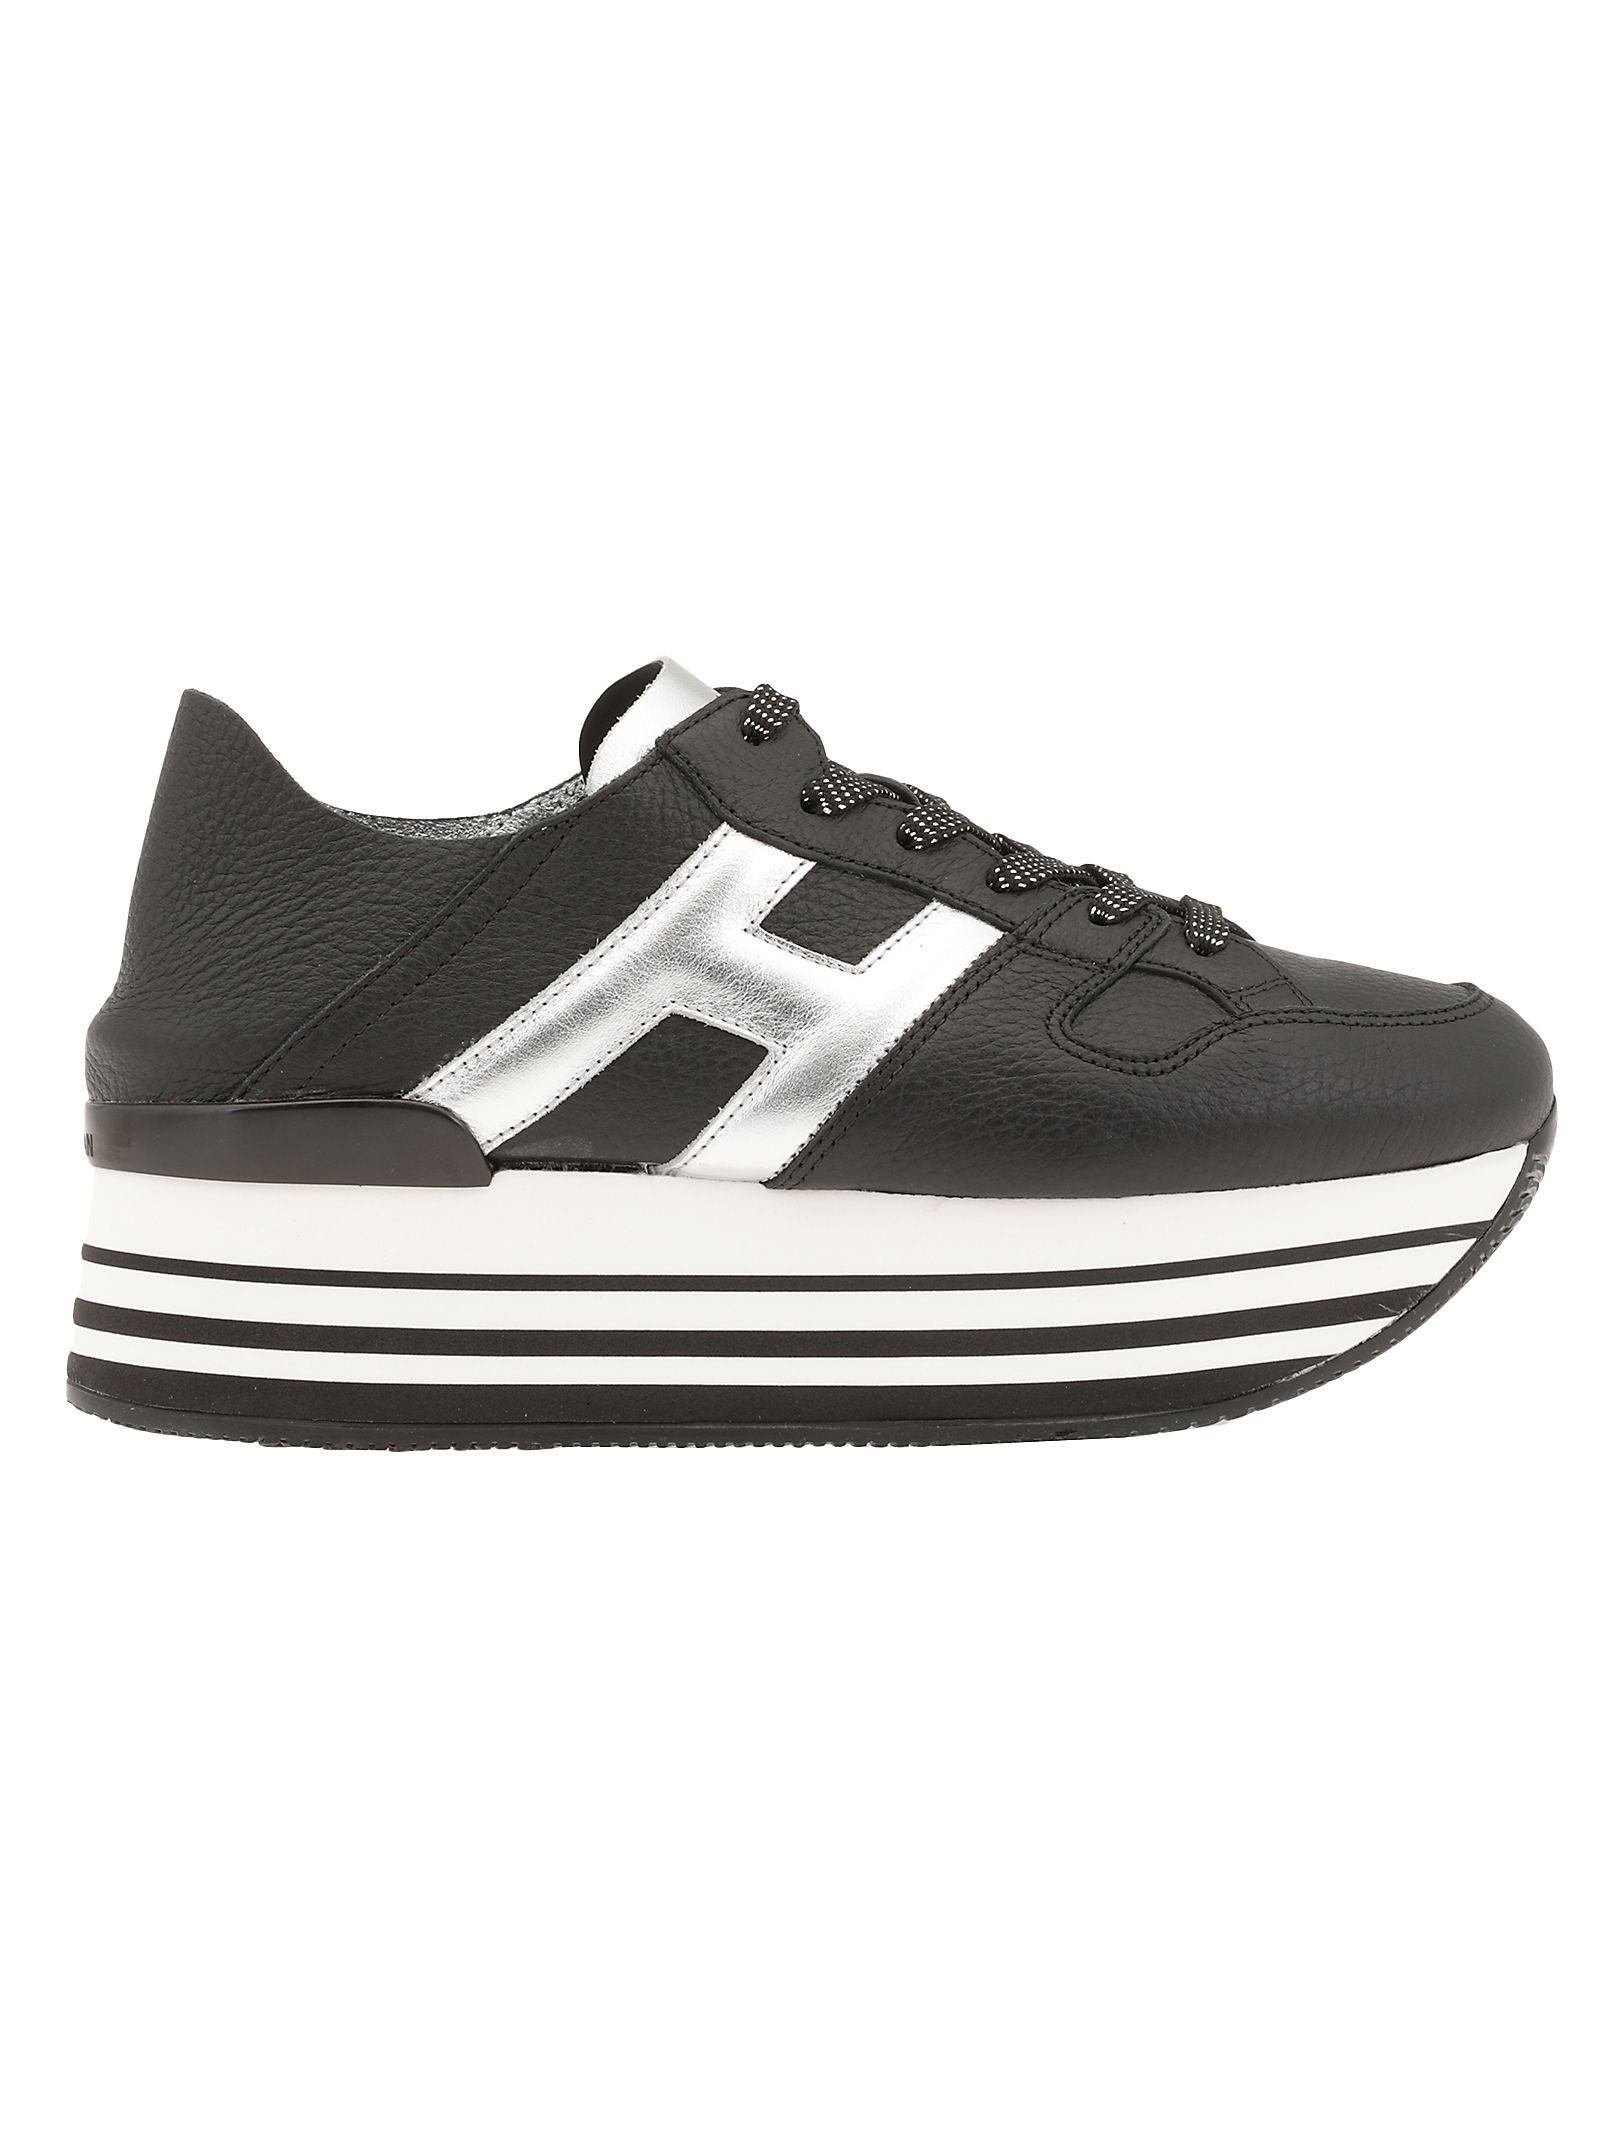 Hogan Maxi H222 Sneaker In 0353(nero argento) b200(argent | ModeSens